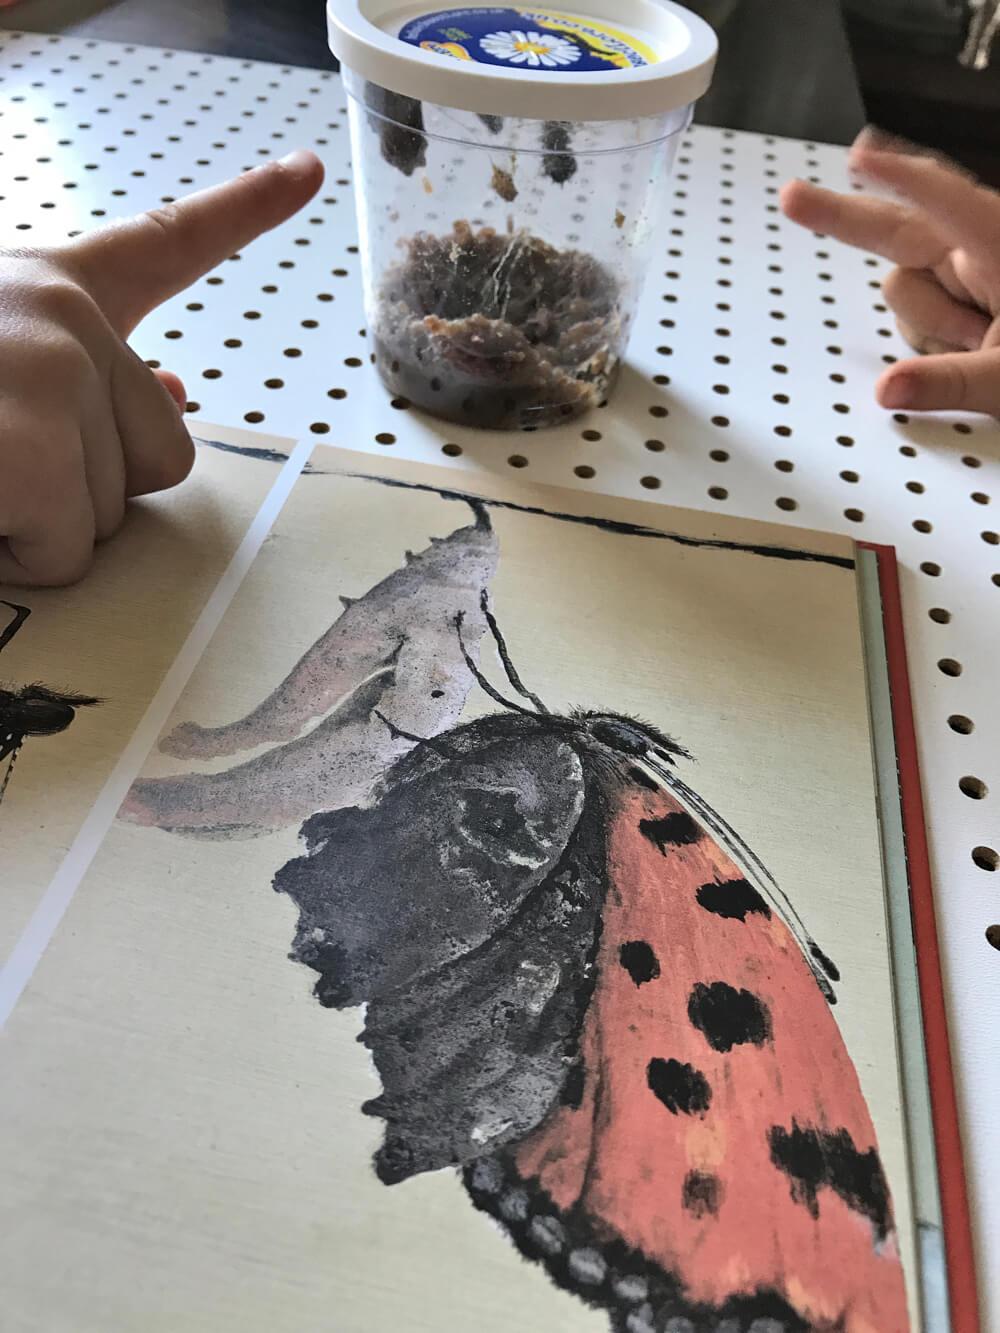 insect lore die kleine botin 3 1